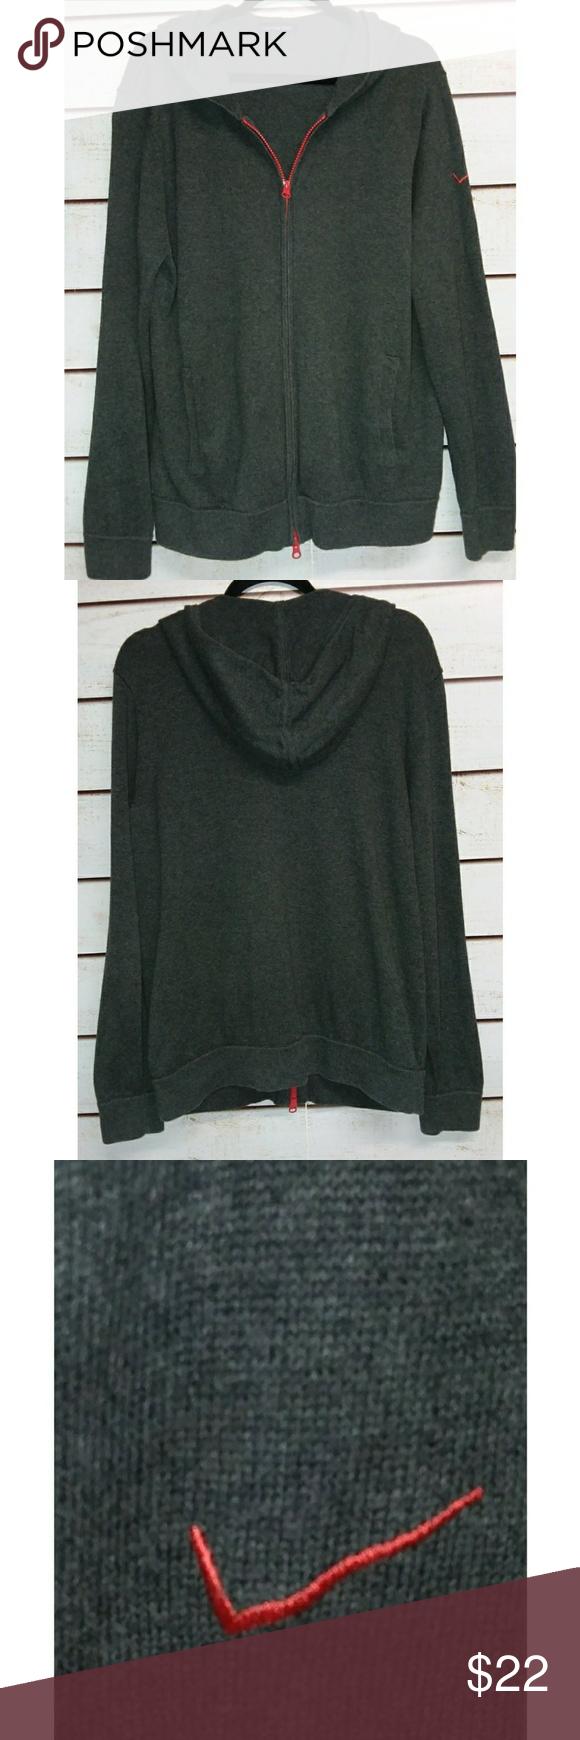 Men S Lands End Cotton Sweater Hoodie L Euc Men S Lands End Gray Sweater Hoodie L 100 Cotton Approx Underarm 24 Clothes Design Grey Sweater Hoodie Fashion [ 1740 x 580 Pixel ]